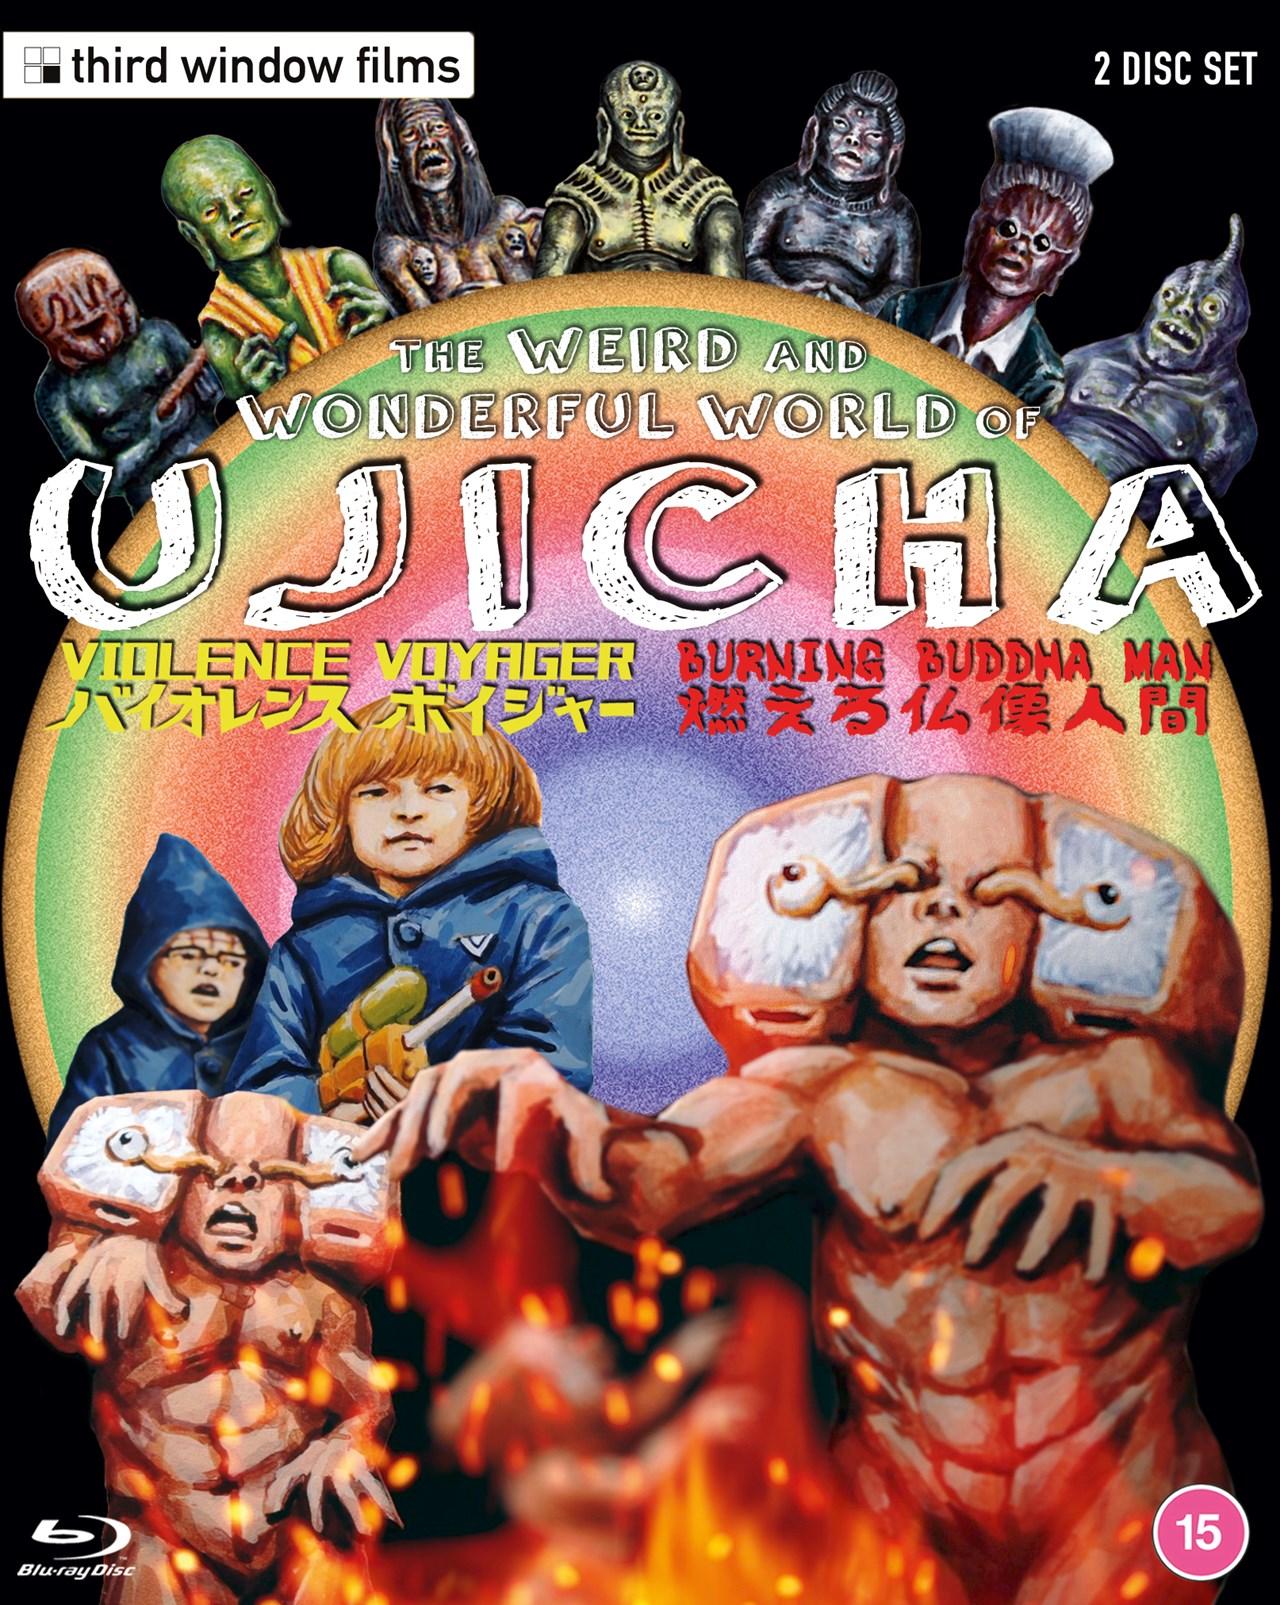 Violence Voyager/The Burning Buddha Man - 1